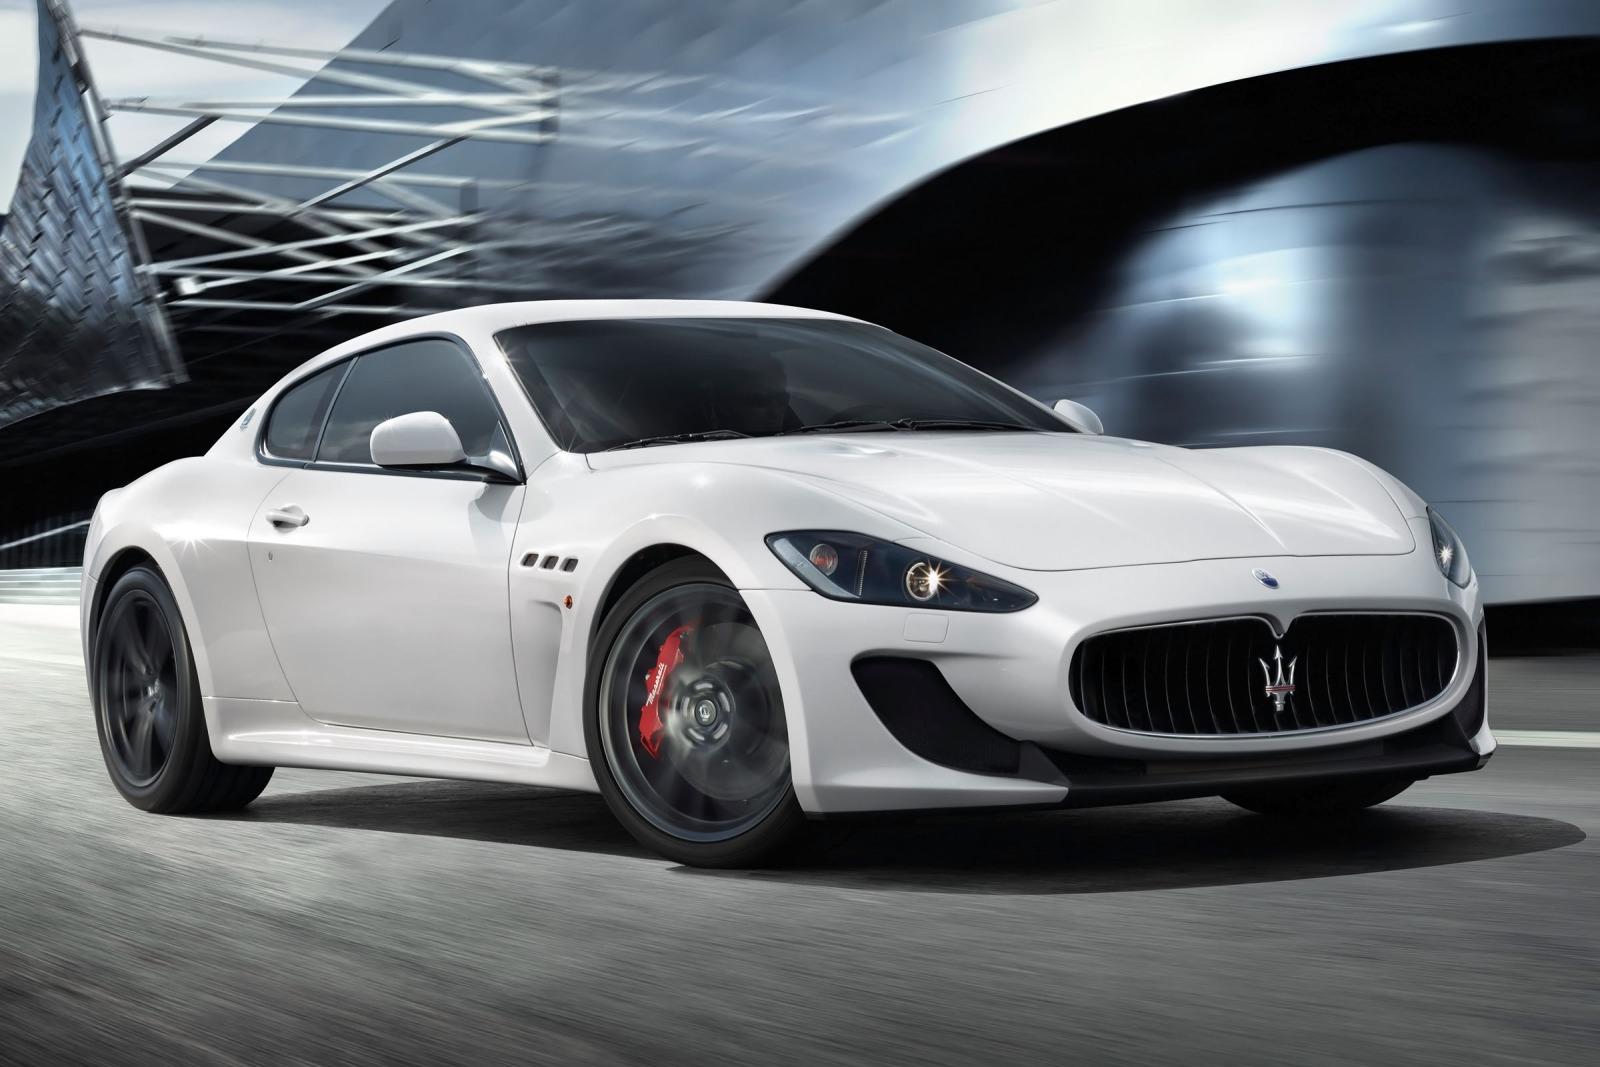 Maintenance Schedule for 2012 Maserati GranTurismo | Openbay